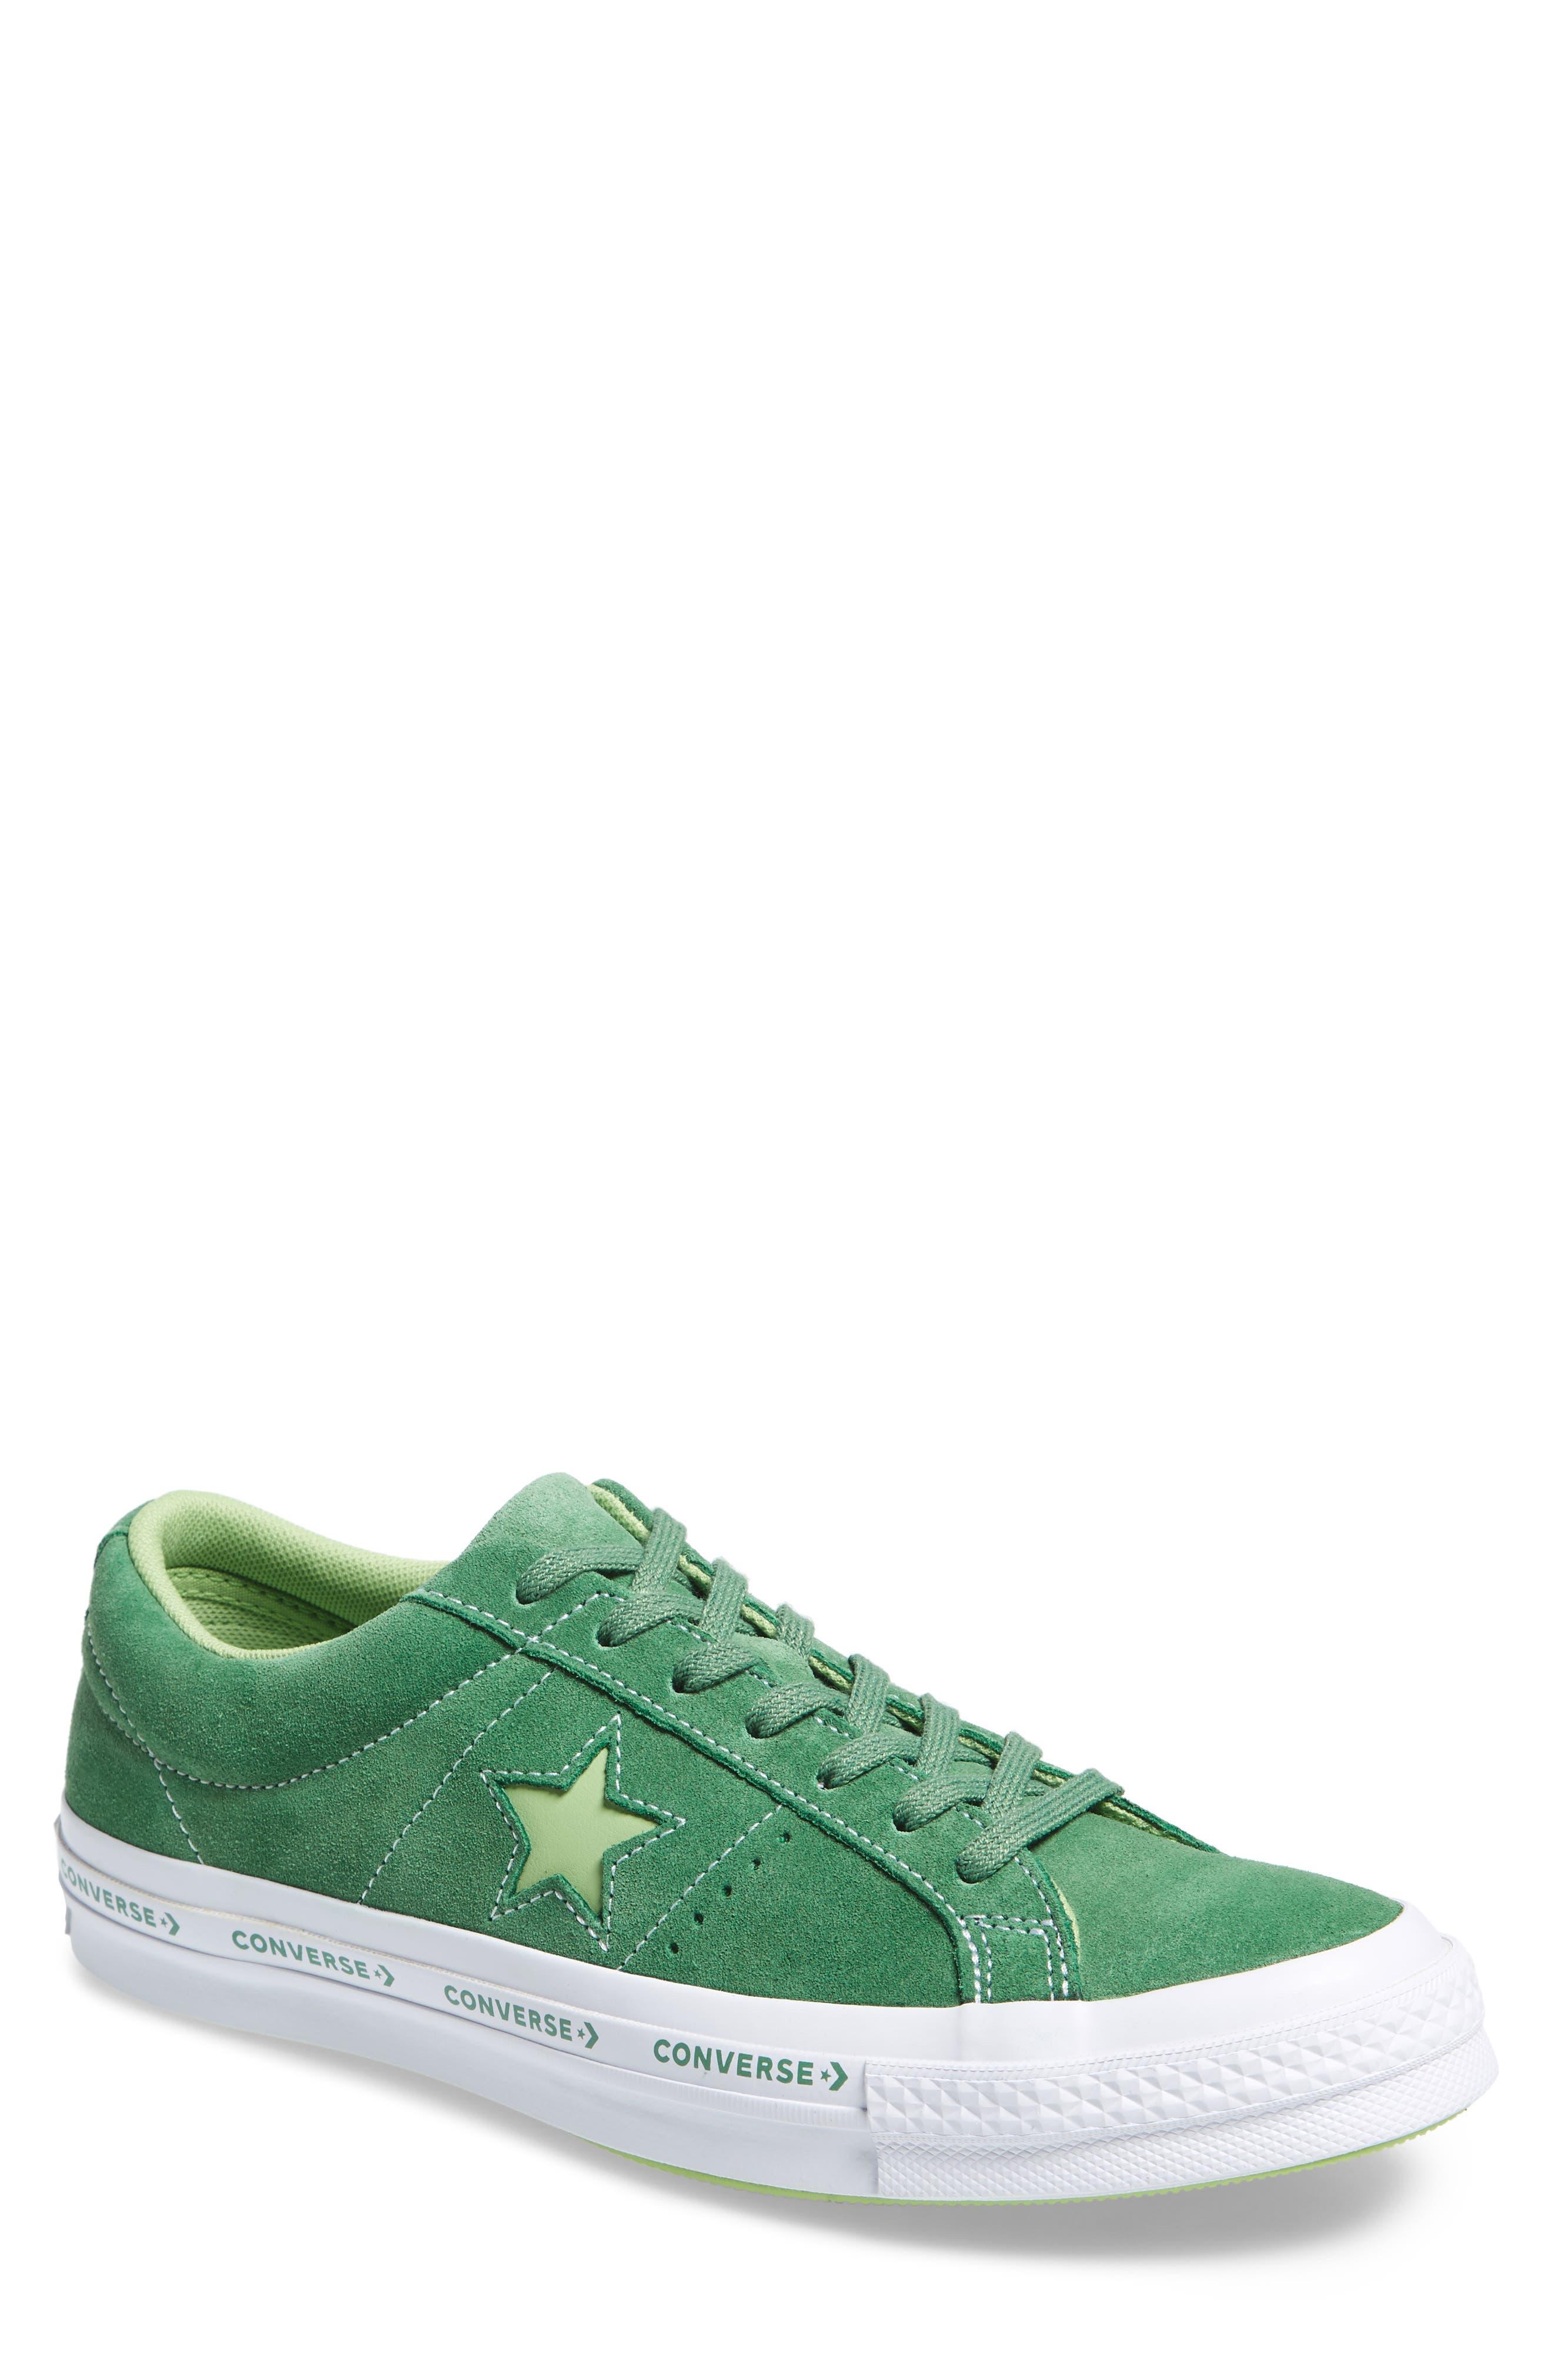 Chuck Taylor<sup>®</sup> One Star Pinstripe Sneaker,                             Main thumbnail 1, color,                             350